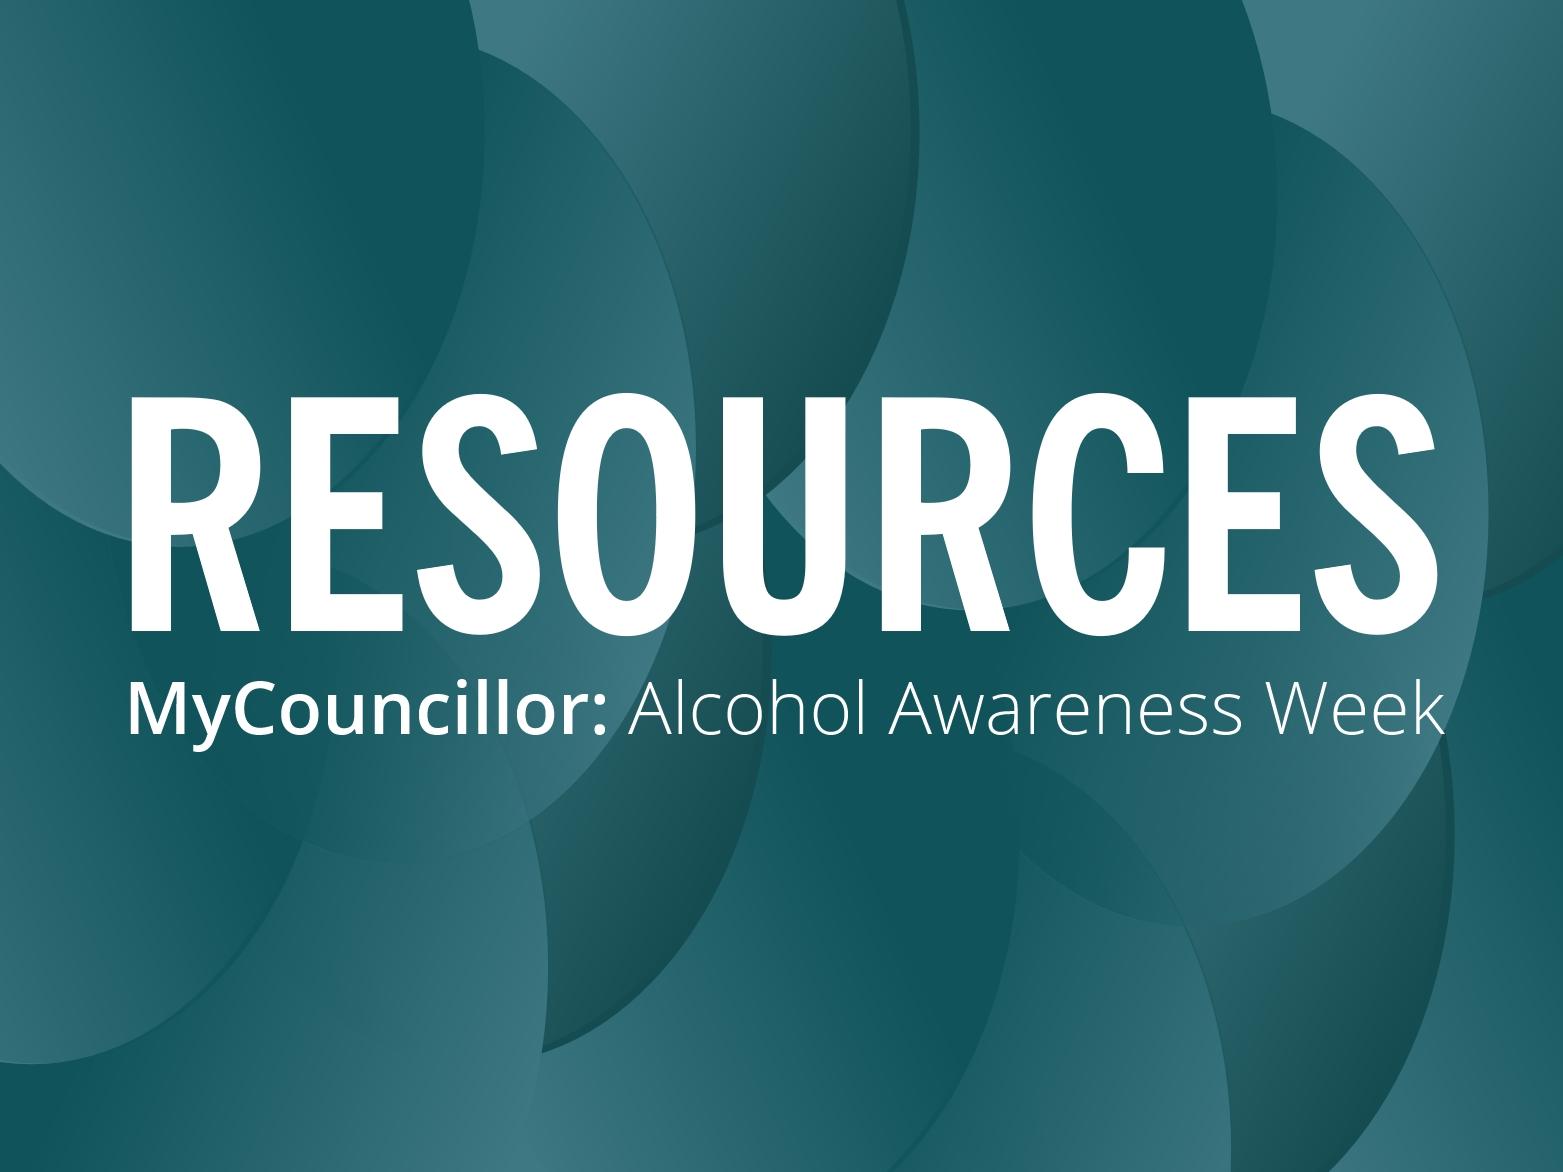 RESOURCE: Alcohol Awareness Week, 13-19 November